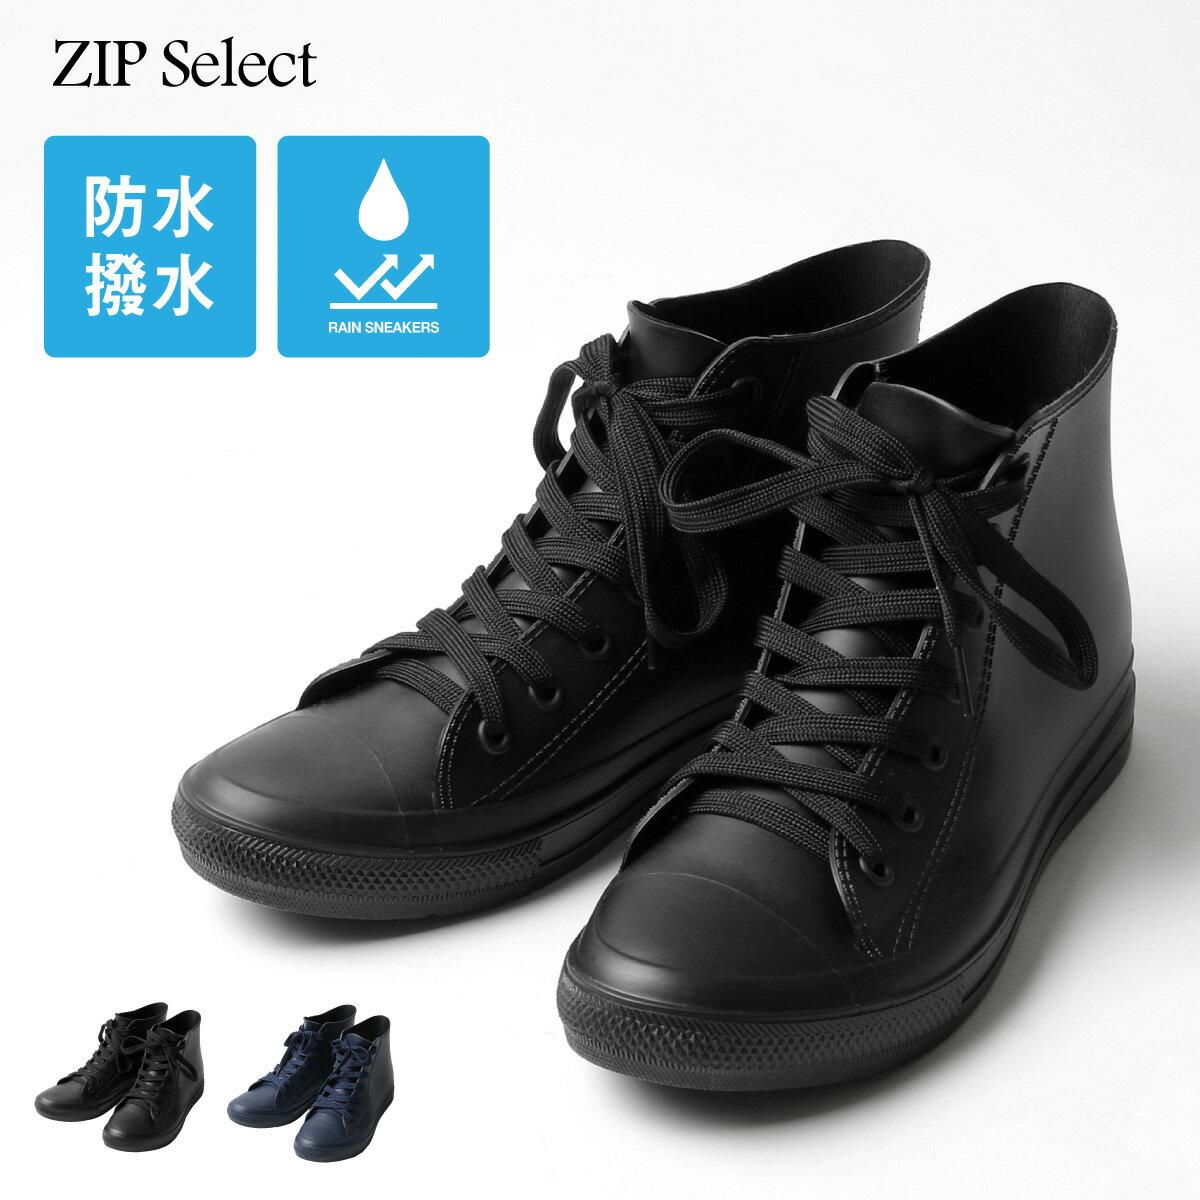 【New】ZIP 長筒 綁鞋帶雨鞋 0